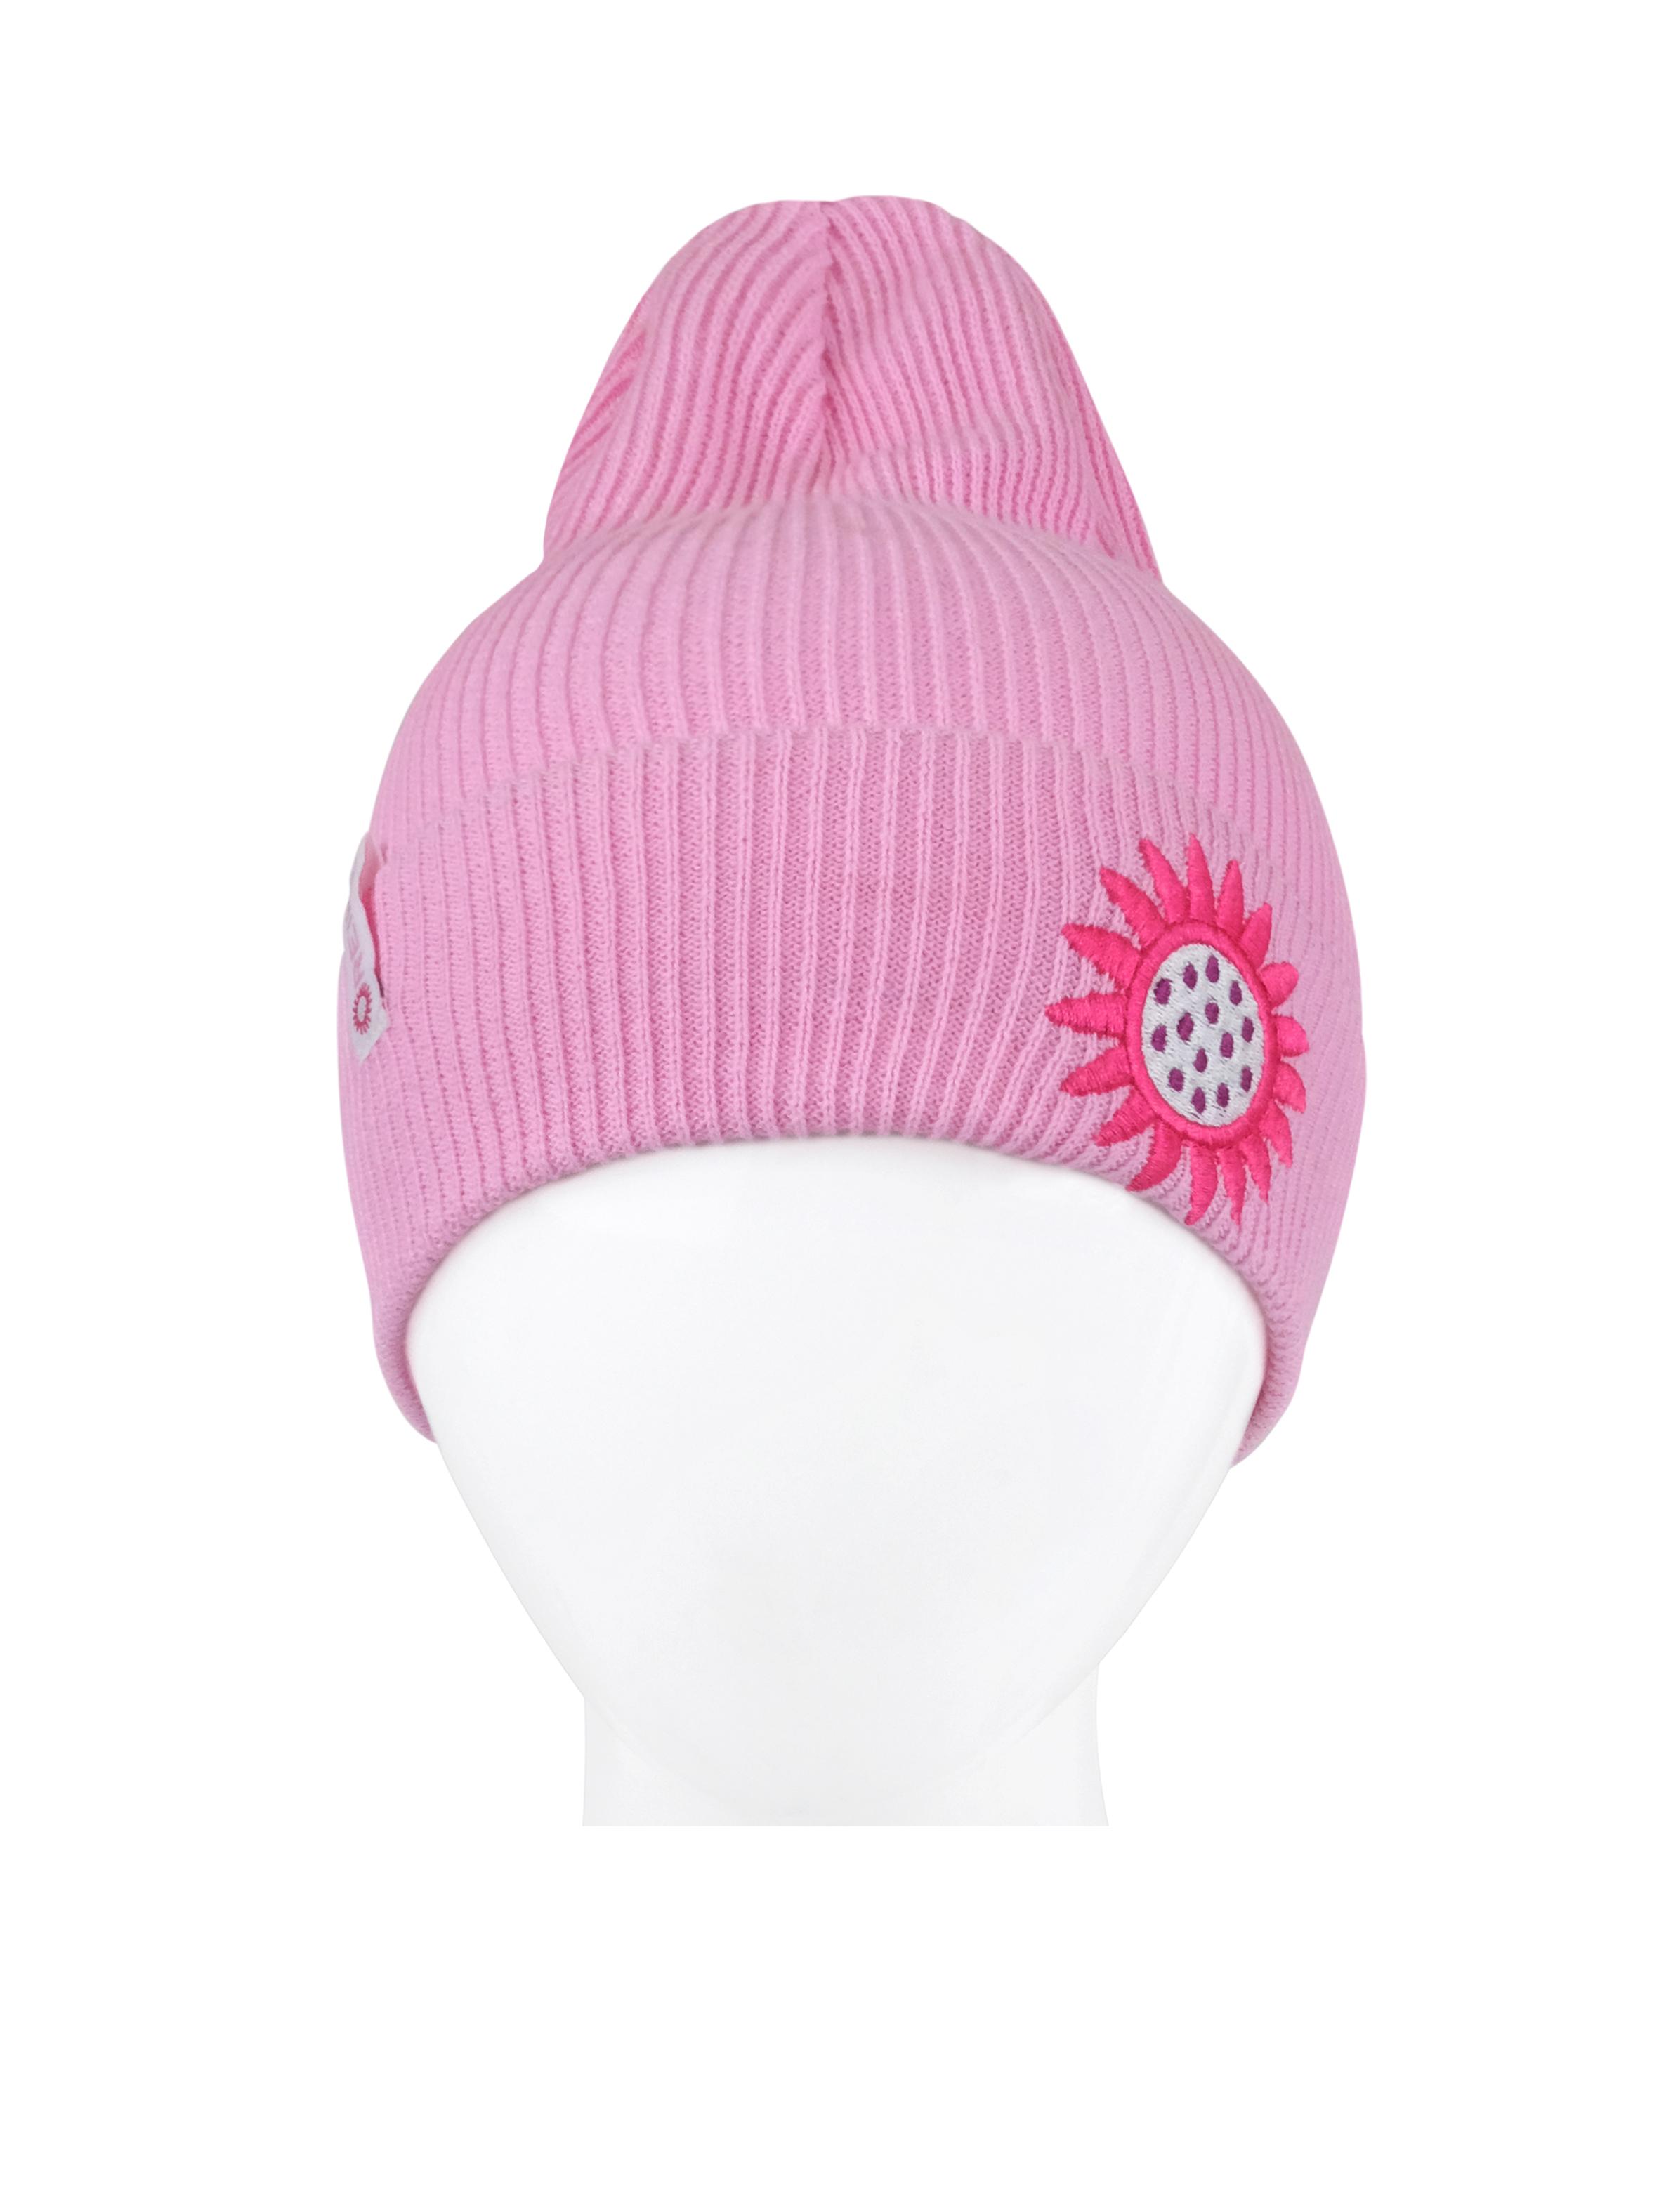 Купить Шапка для девочки Reike Сute bees pink, RKNSS20-CUB-YN-5 pink, р.52,